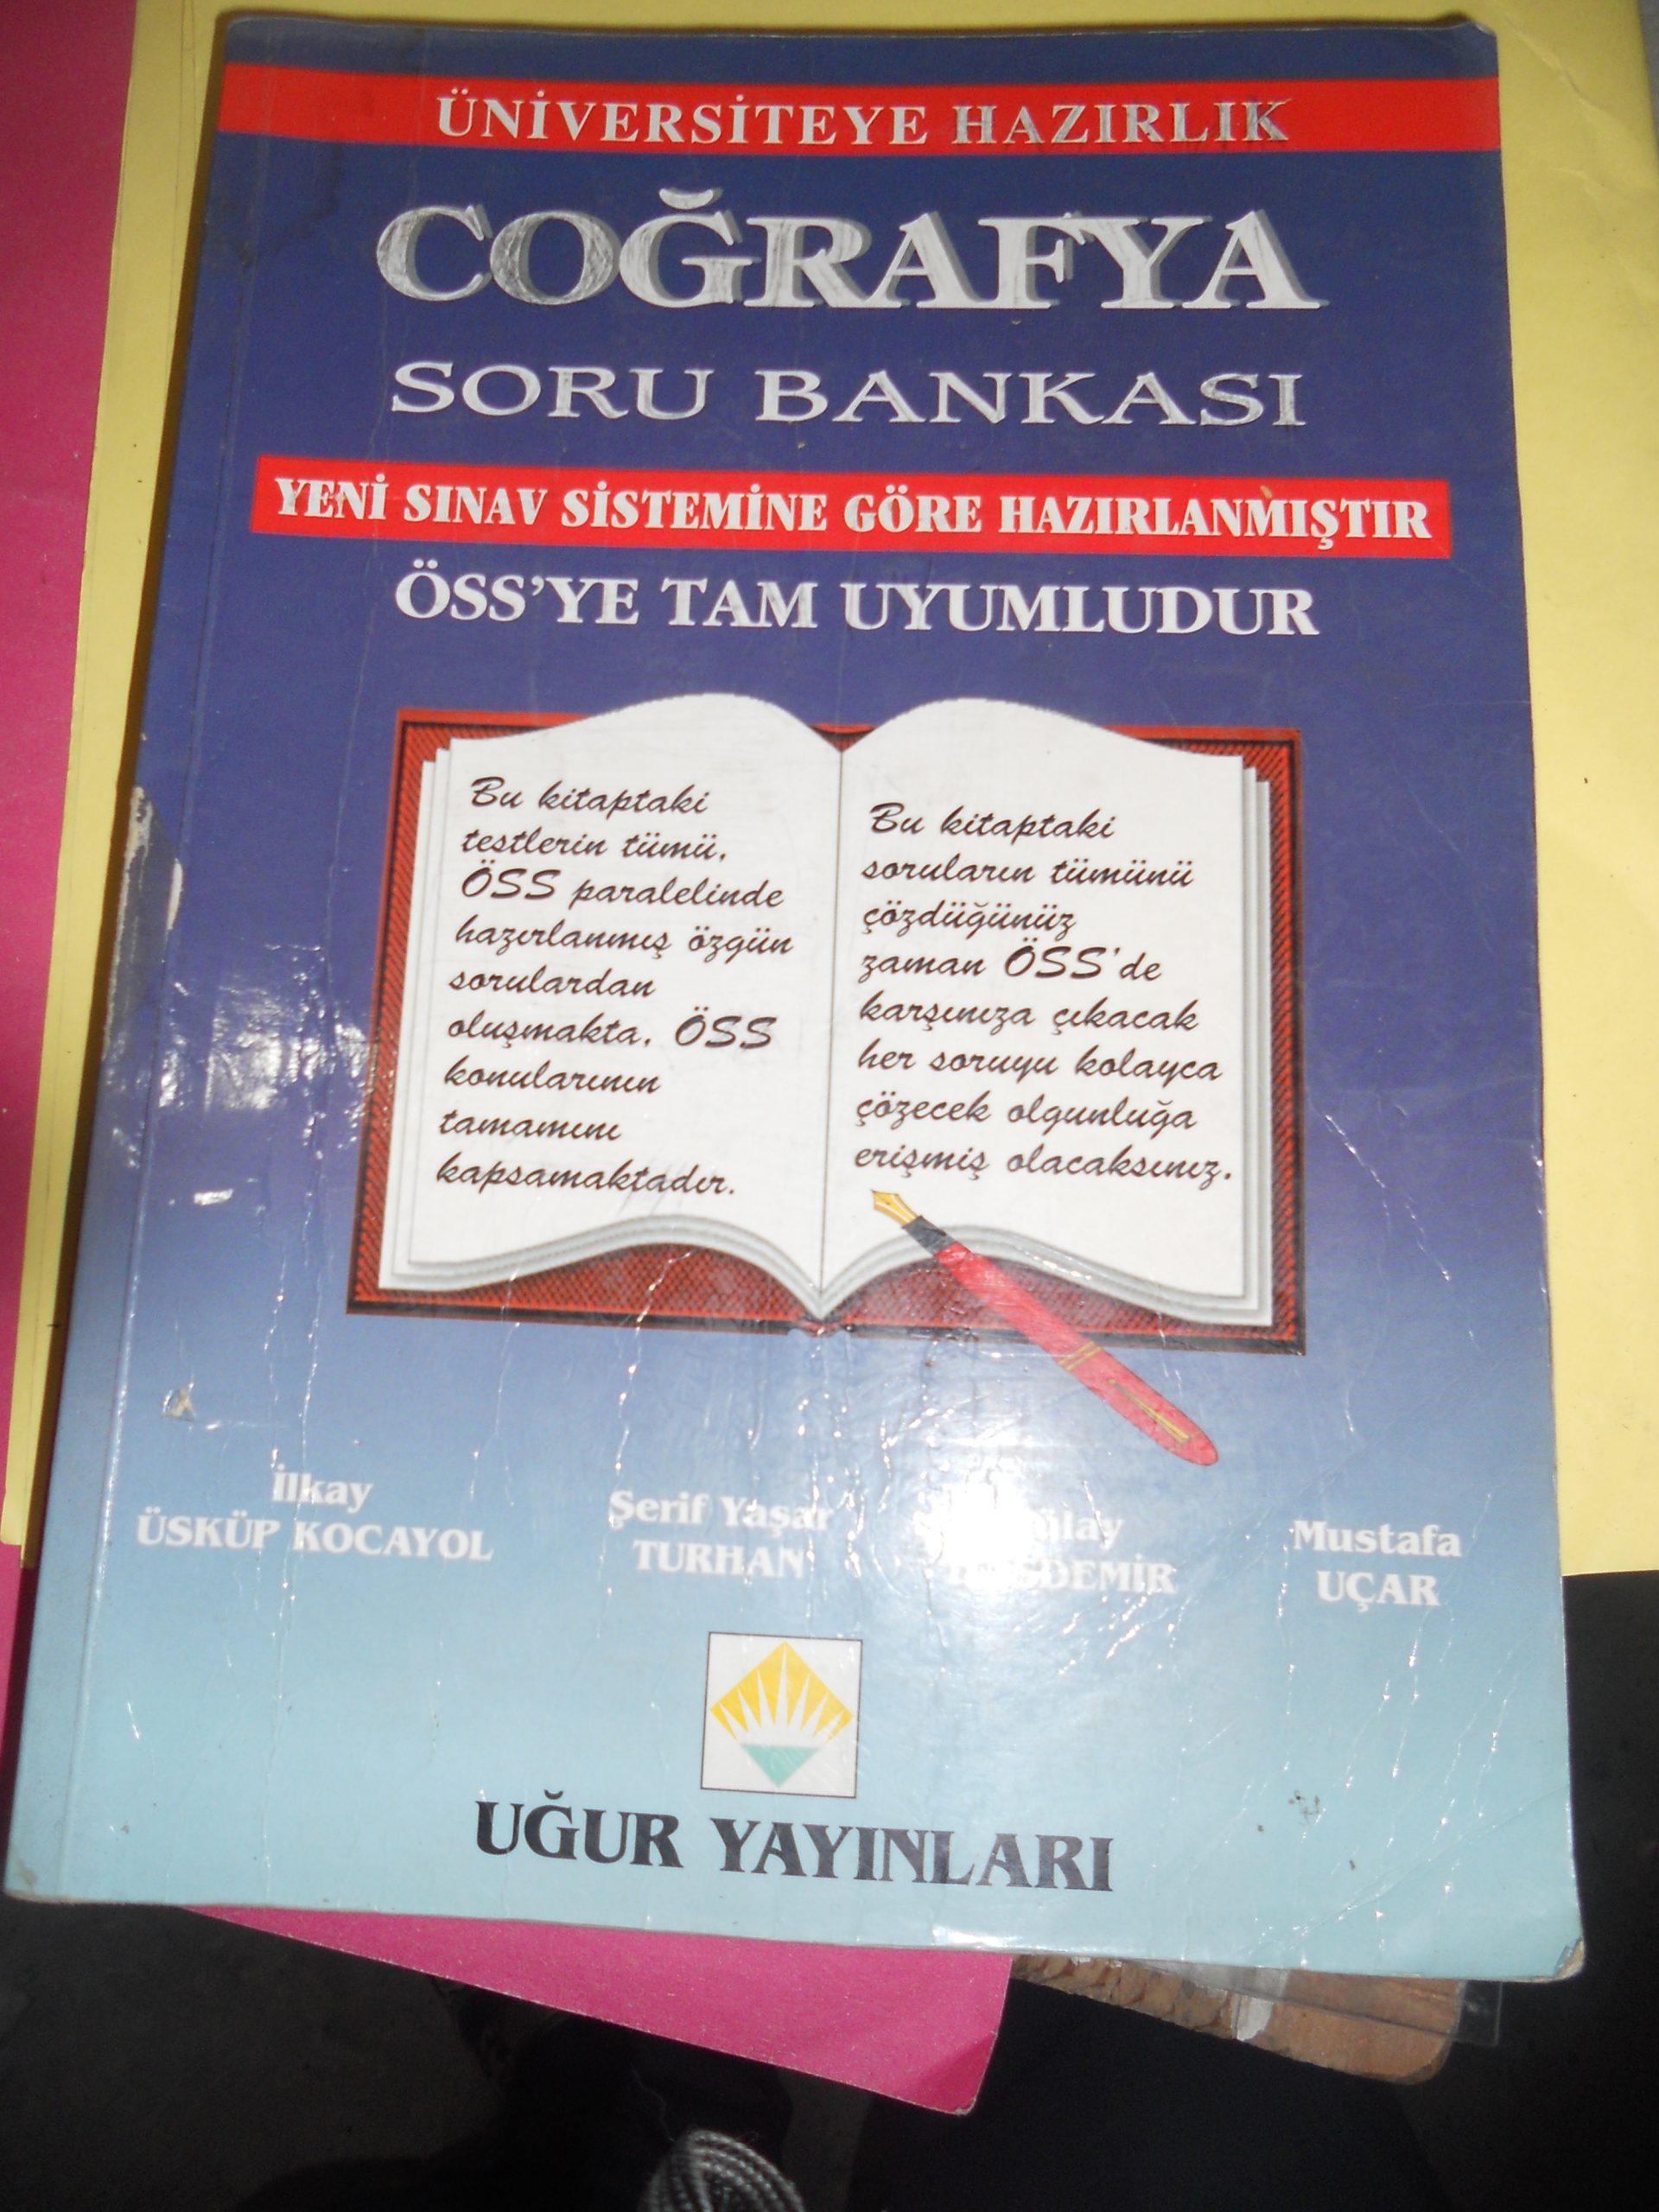 ÜNİVERSİTEYE HAZIRLIK-COĞRAFYA SORU BANKASI/UĞUR YAY/15TL